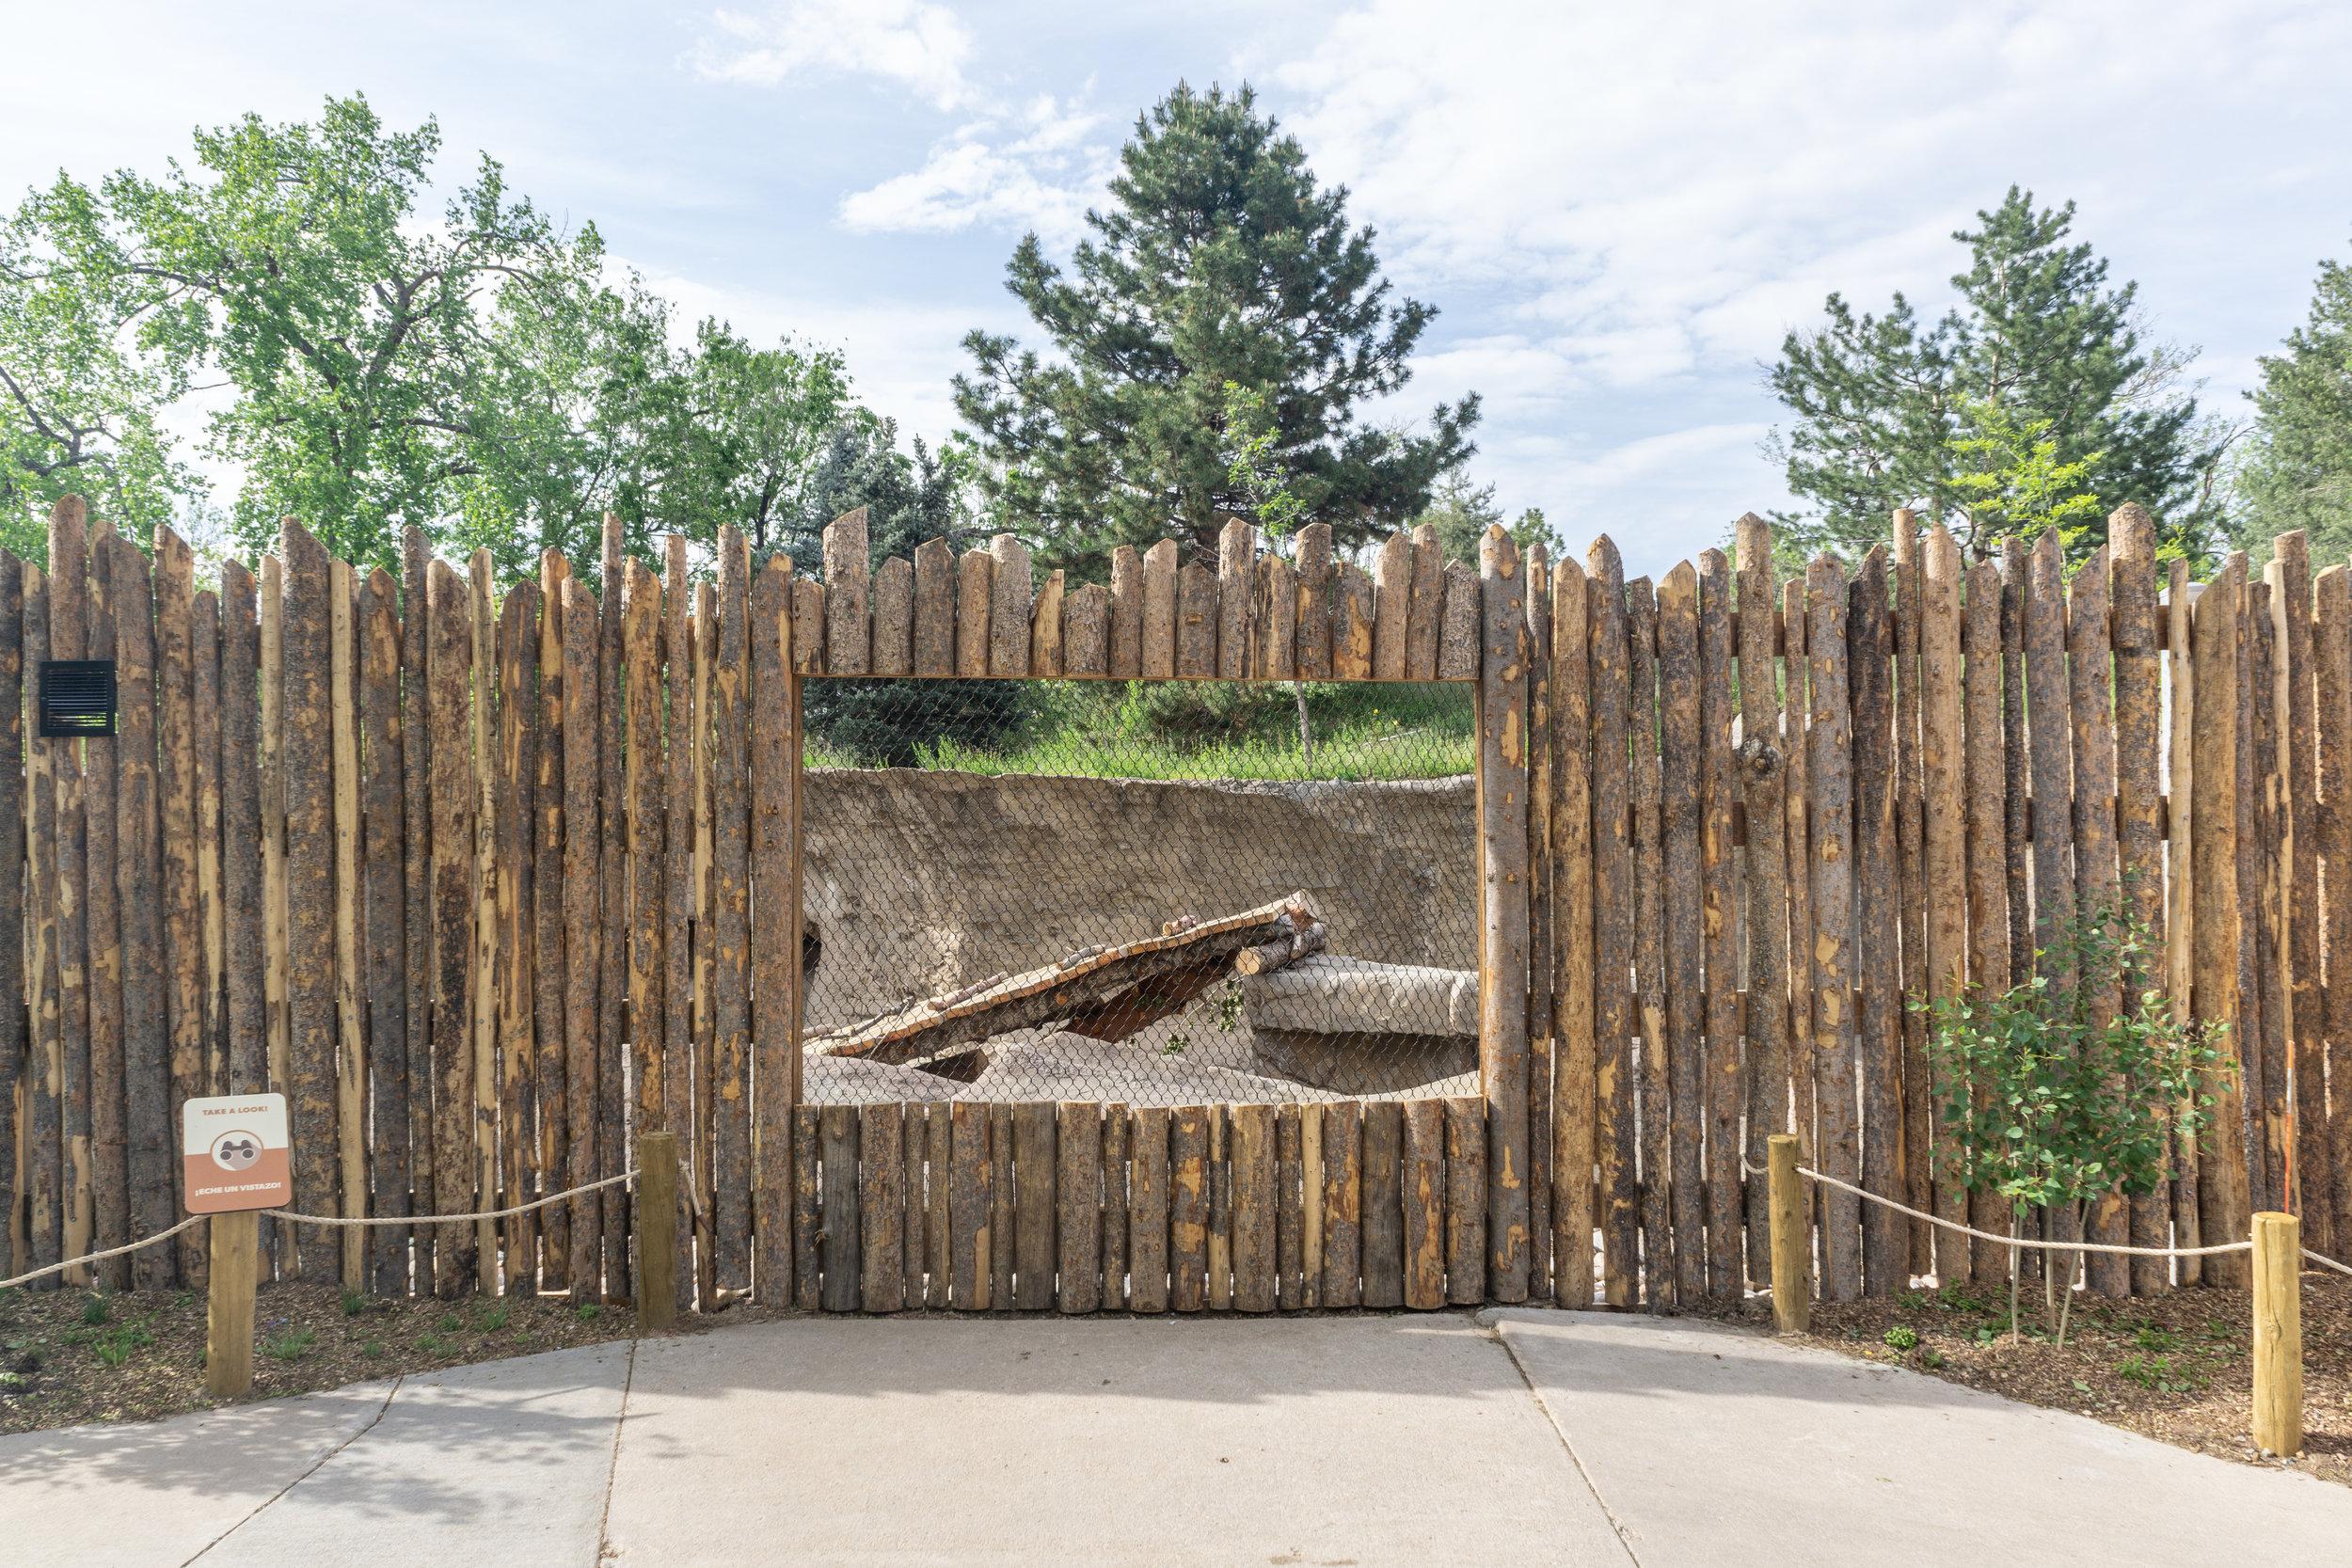 4338.00 - Denver Zoo - Grizzly Bears - 47.jpg